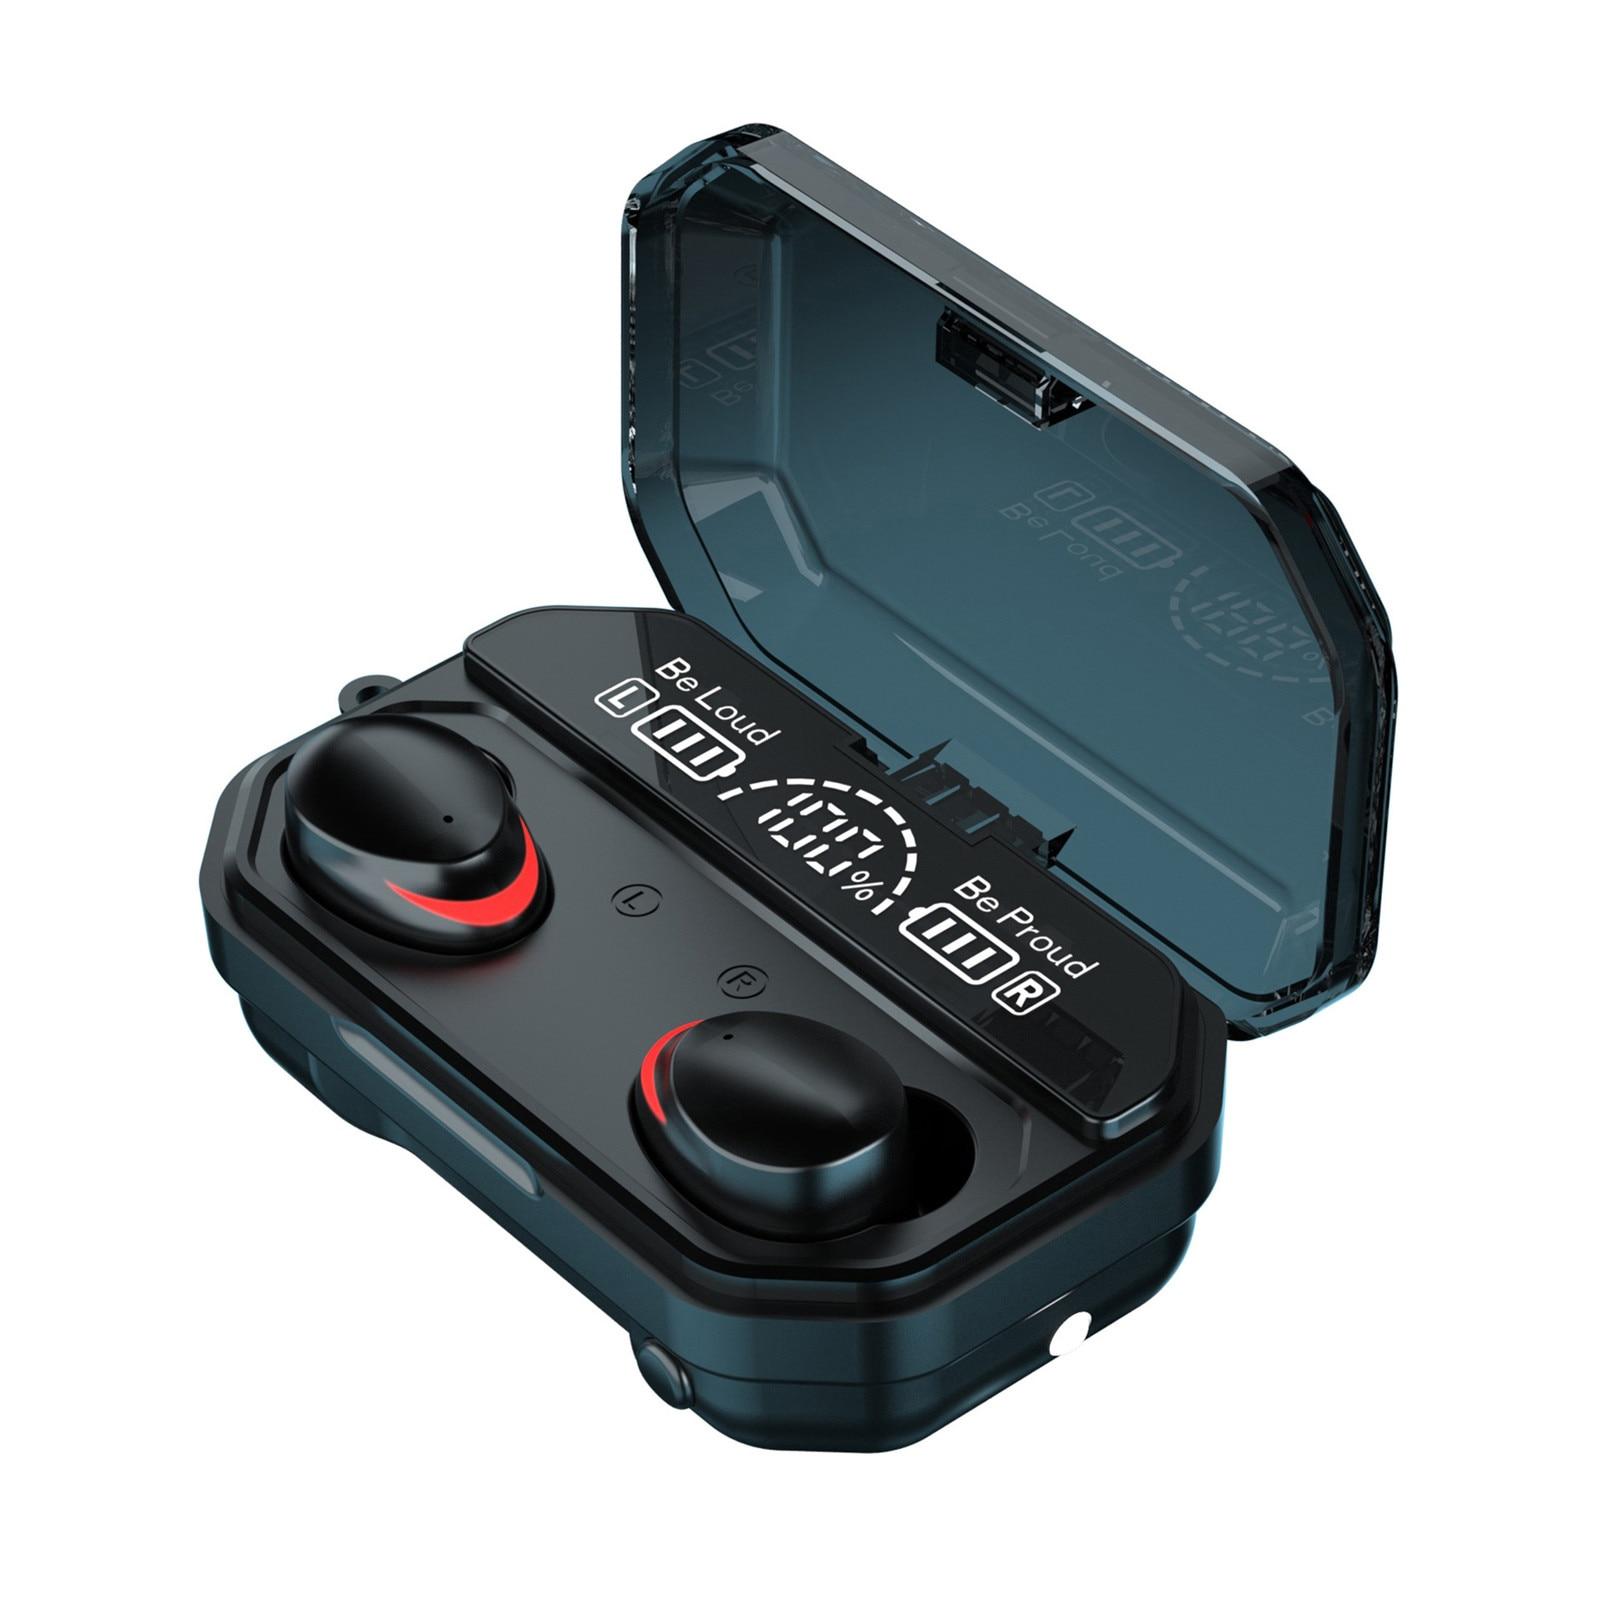 Fone de ouvido bluetooth 5.1 a17, estéreo, sem fio, pequeno, para apple, xiaomi, huawei, samsung, xaomi